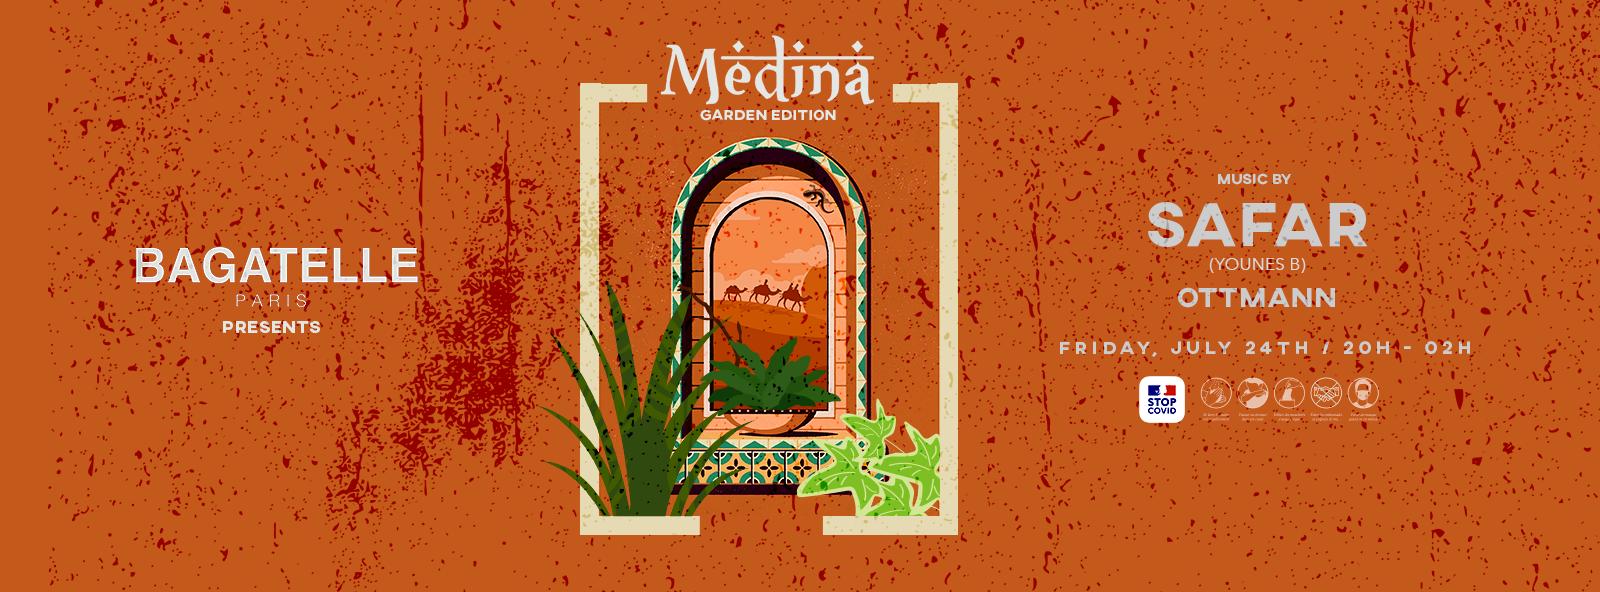 Bagatelle Paris presents Medina